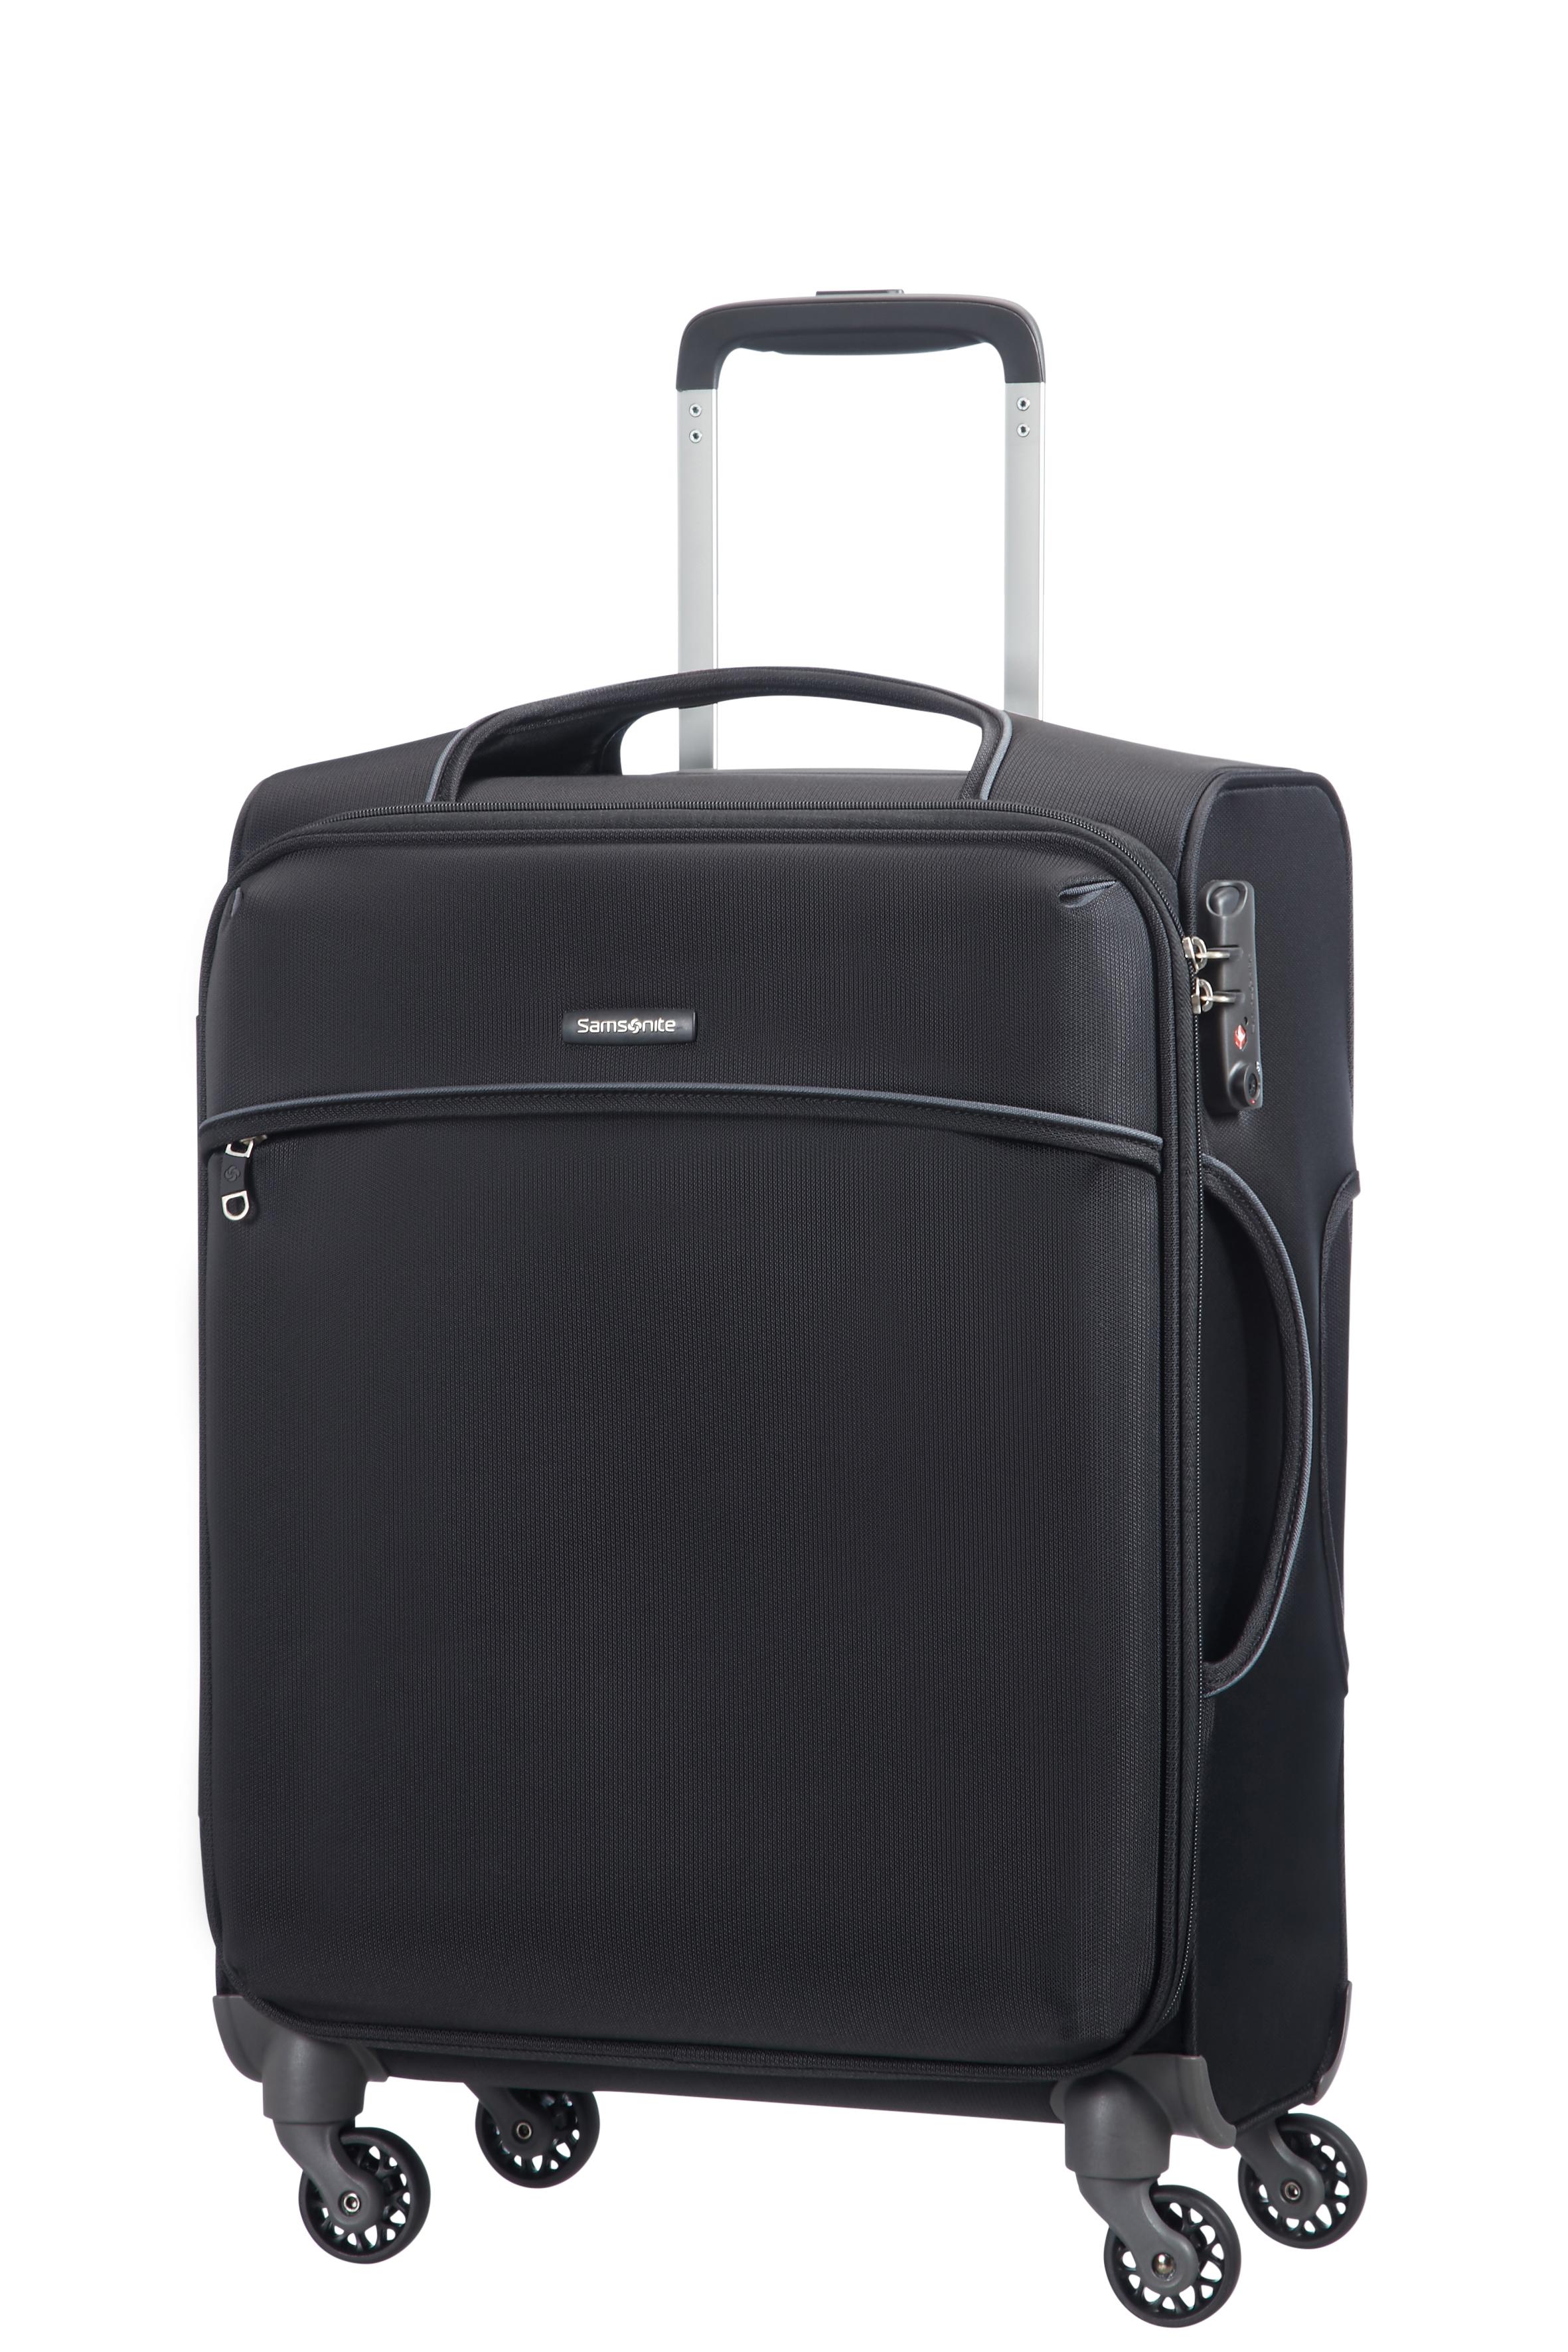 SAMSONITE - Βαλίτσα μεγάλου μεγέθους B-LITE FRESH SPINNER μαύρη γυναικεία αξεσουάρ είδη ταξιδίου βαλίτσες μεγάλες